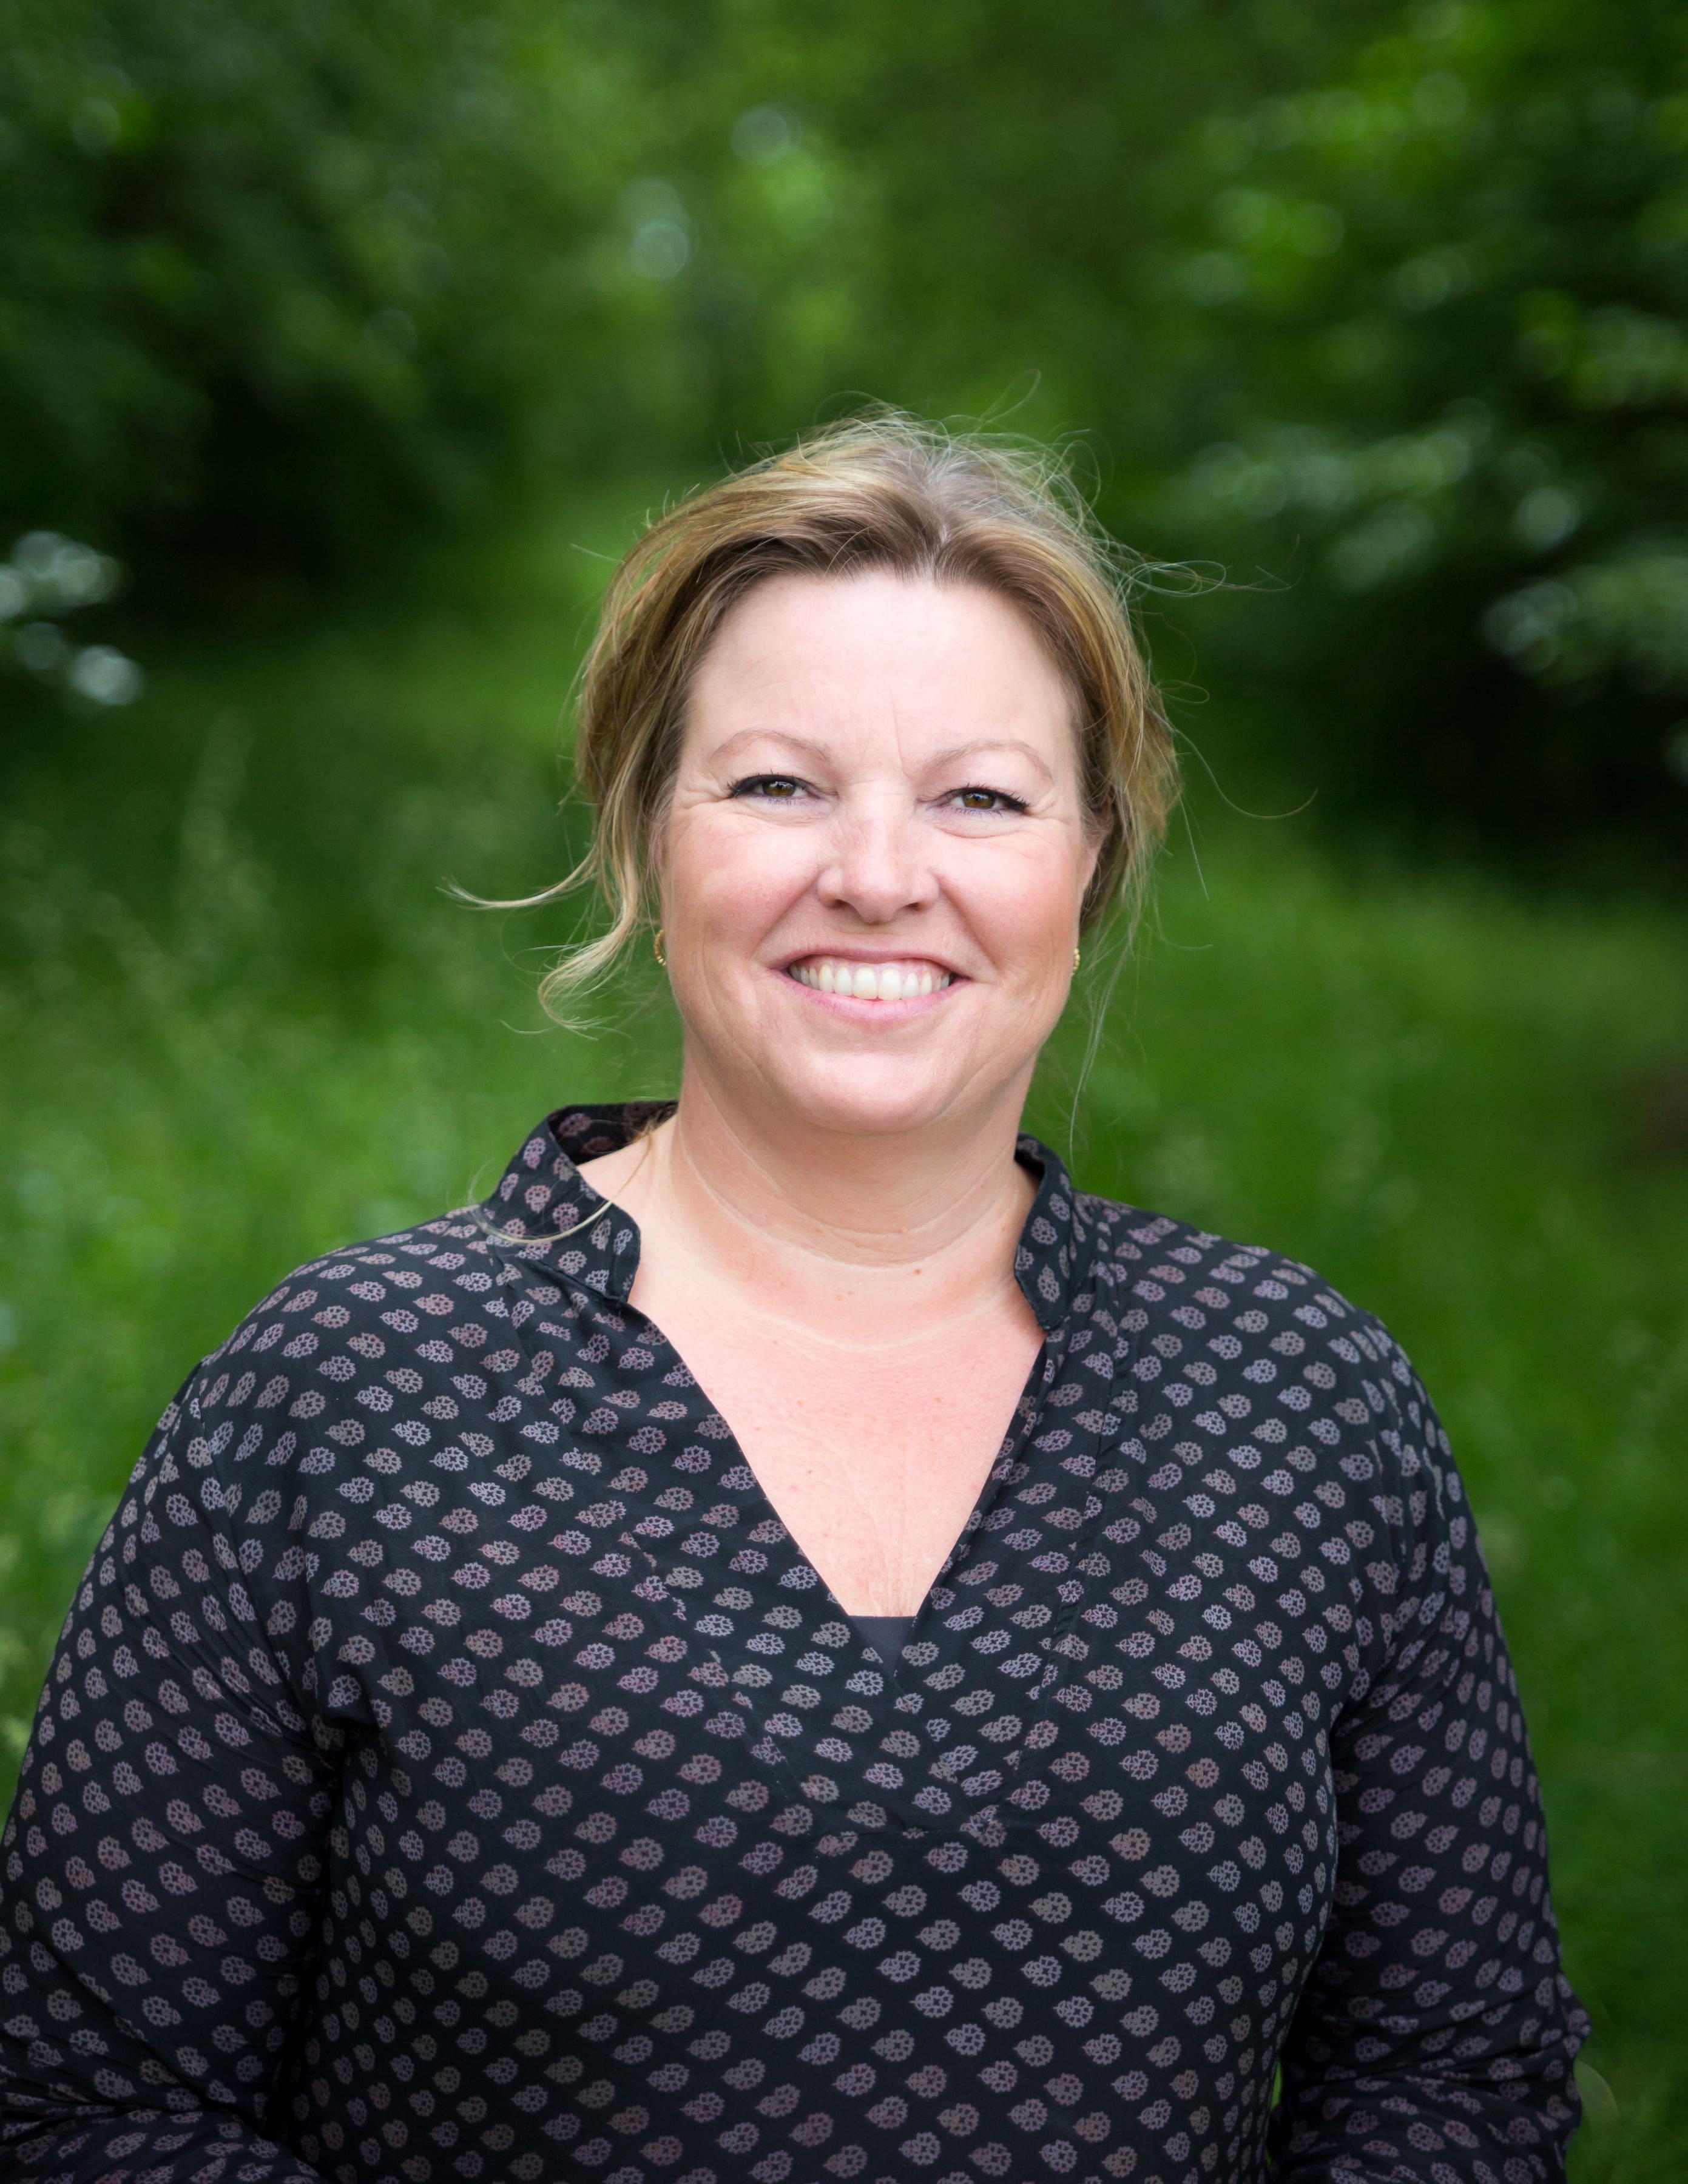 Camilla Puggaard Holst : Managing Director